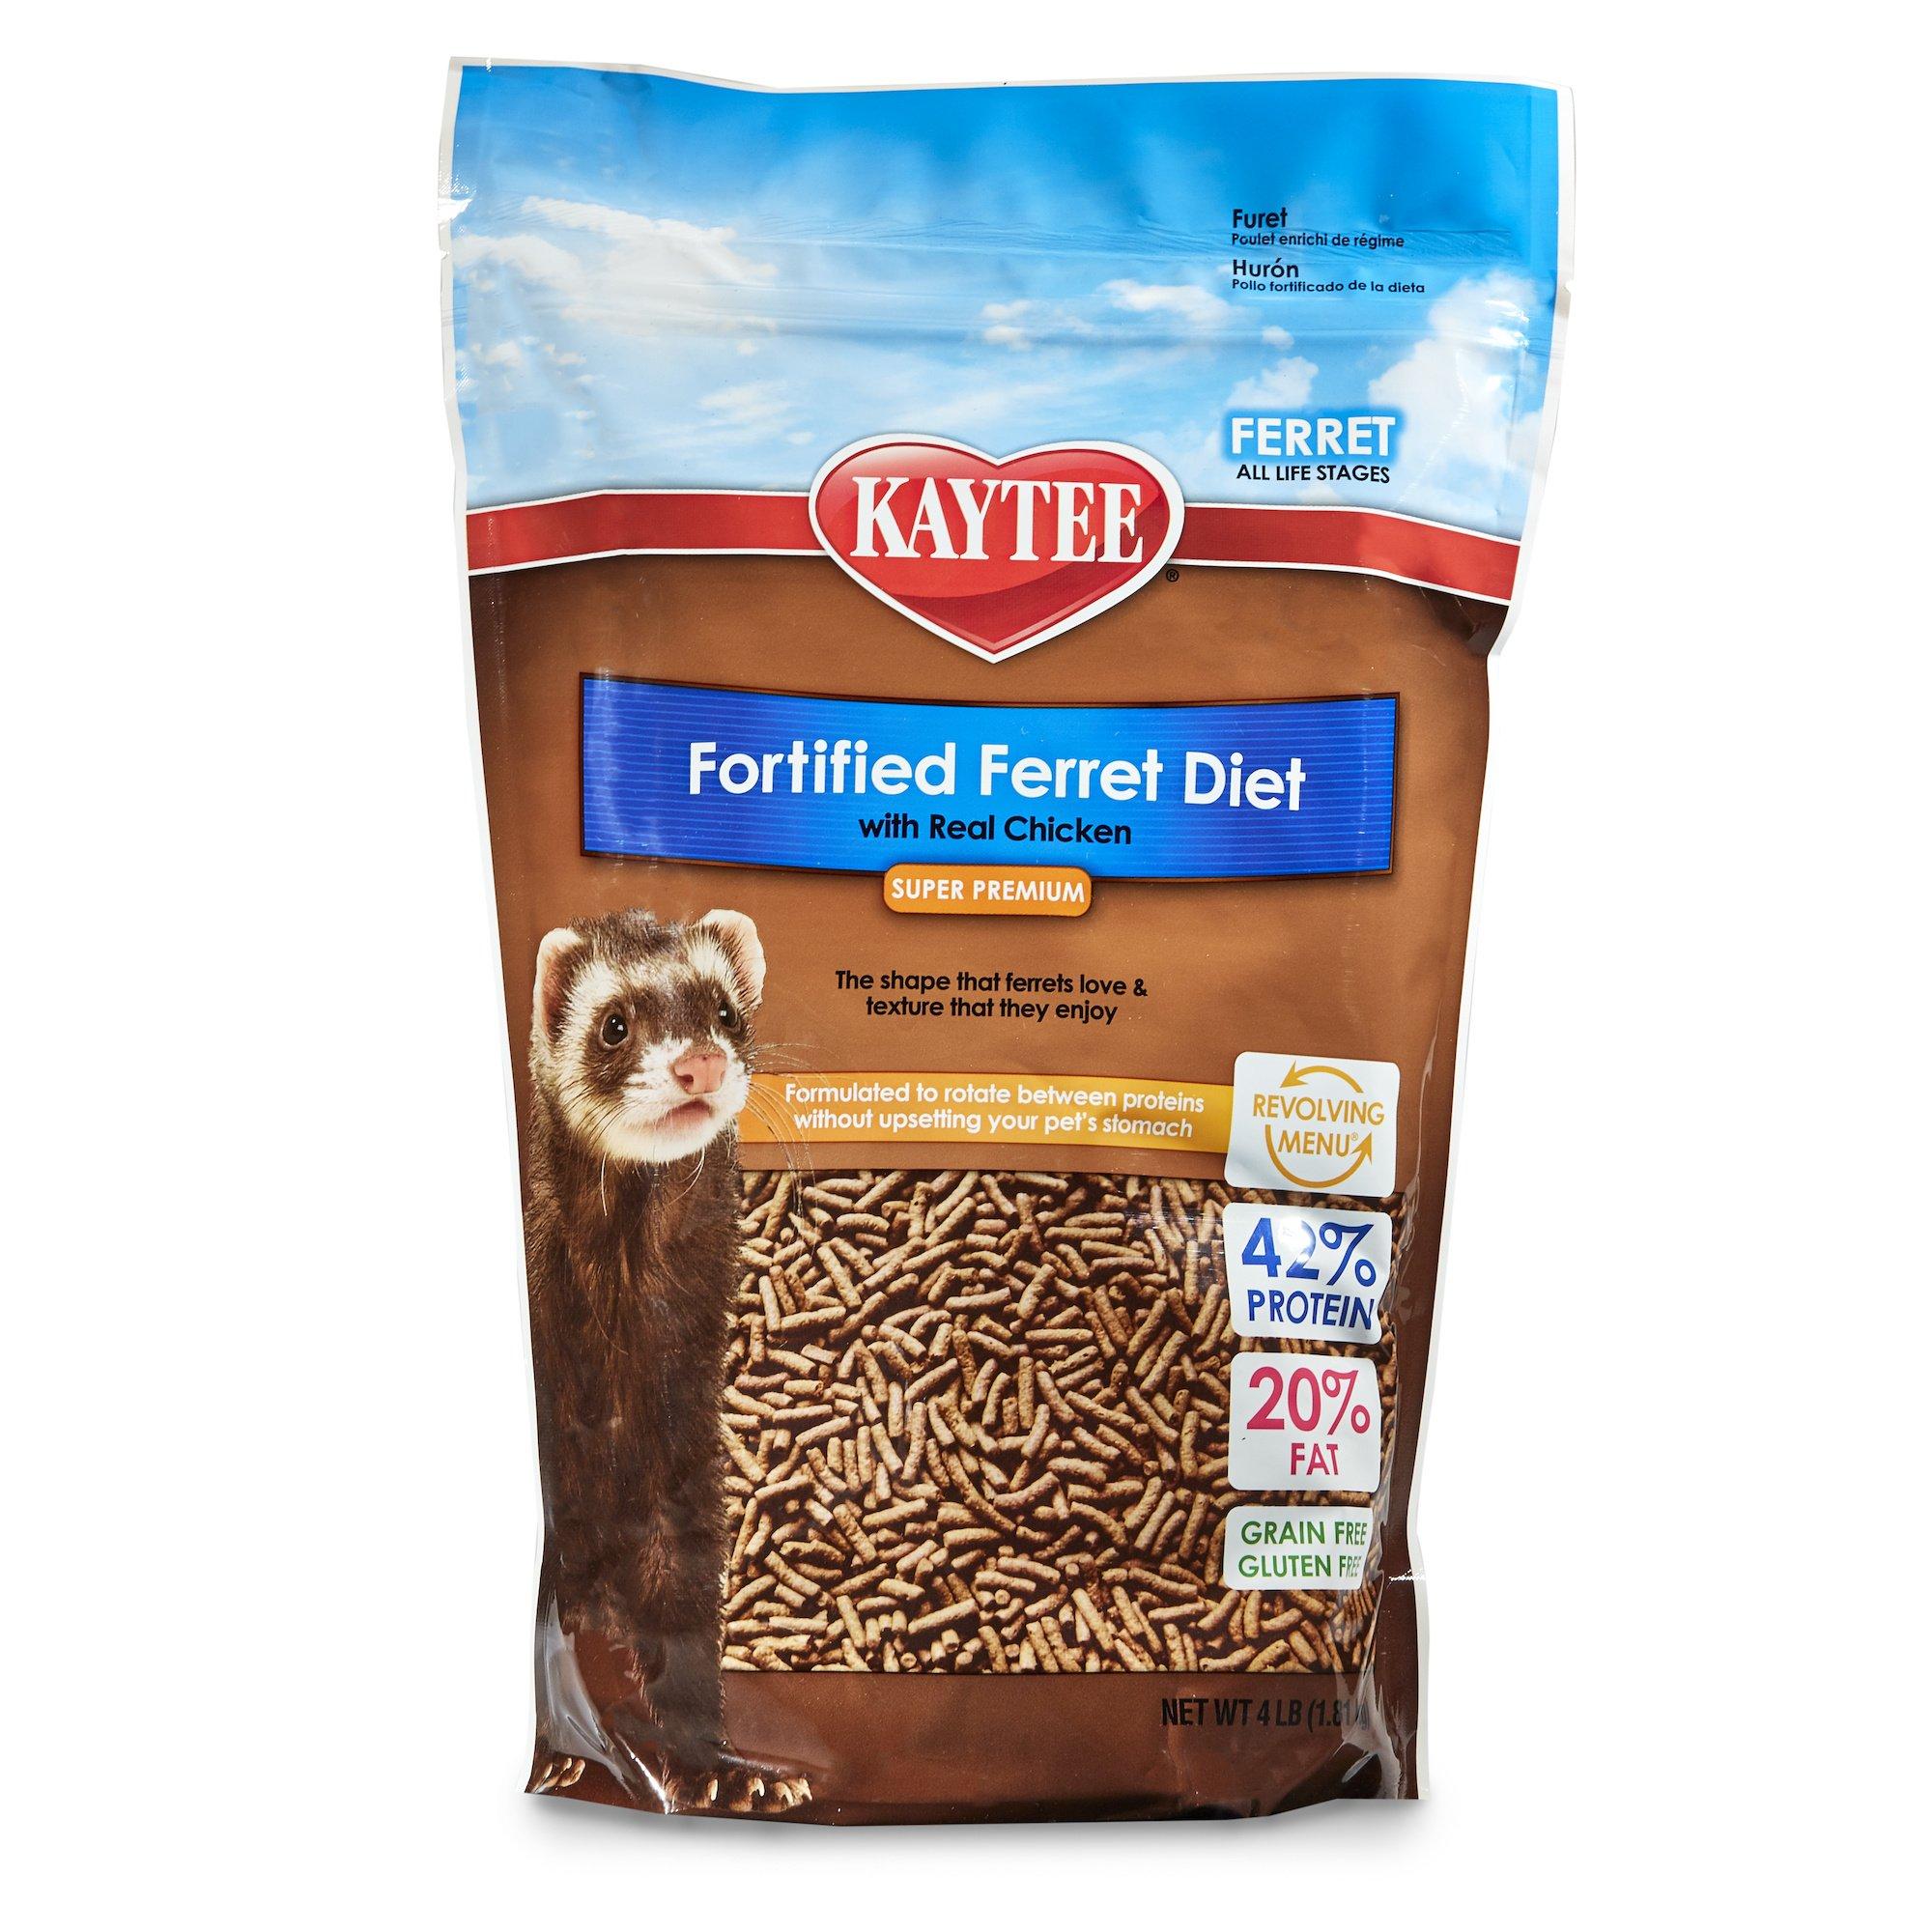 Kaytee Premium Ferret Food with Chicken, 4-Ib